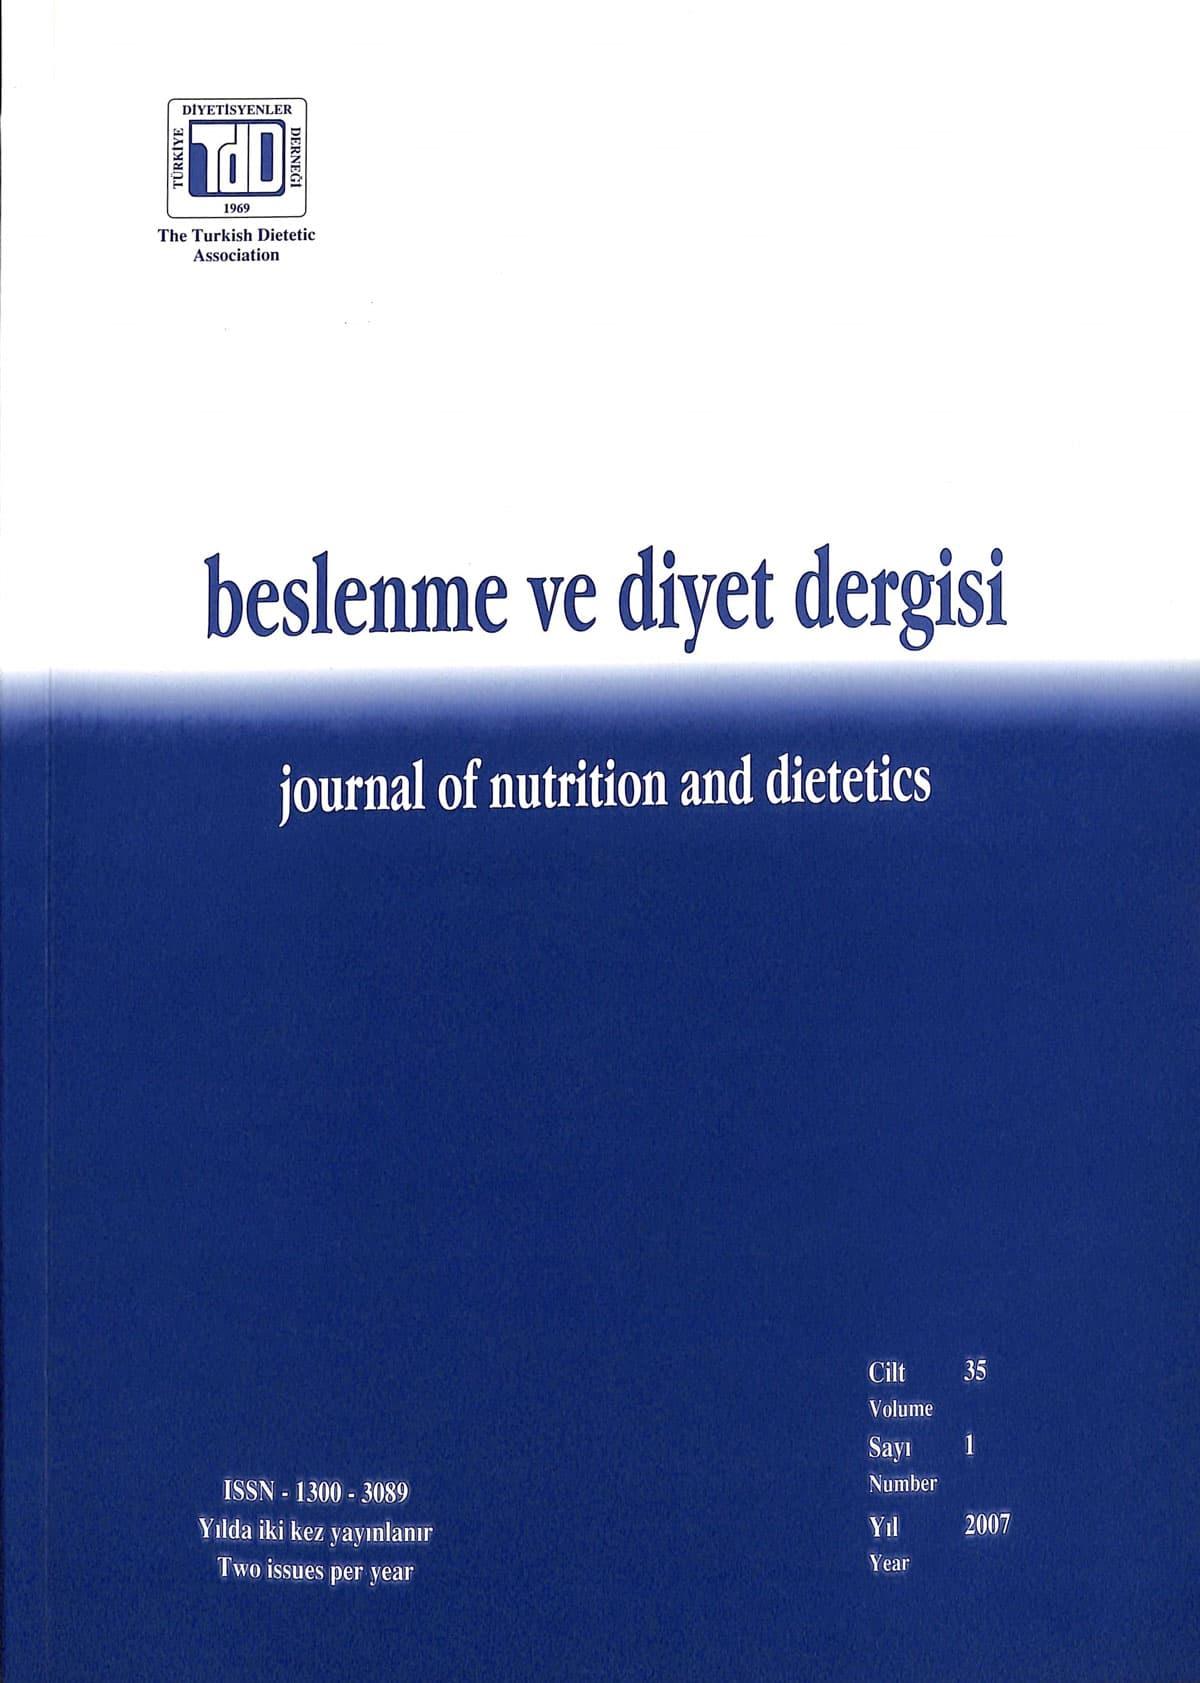 Cilt 35 Sayı 1 (2007)